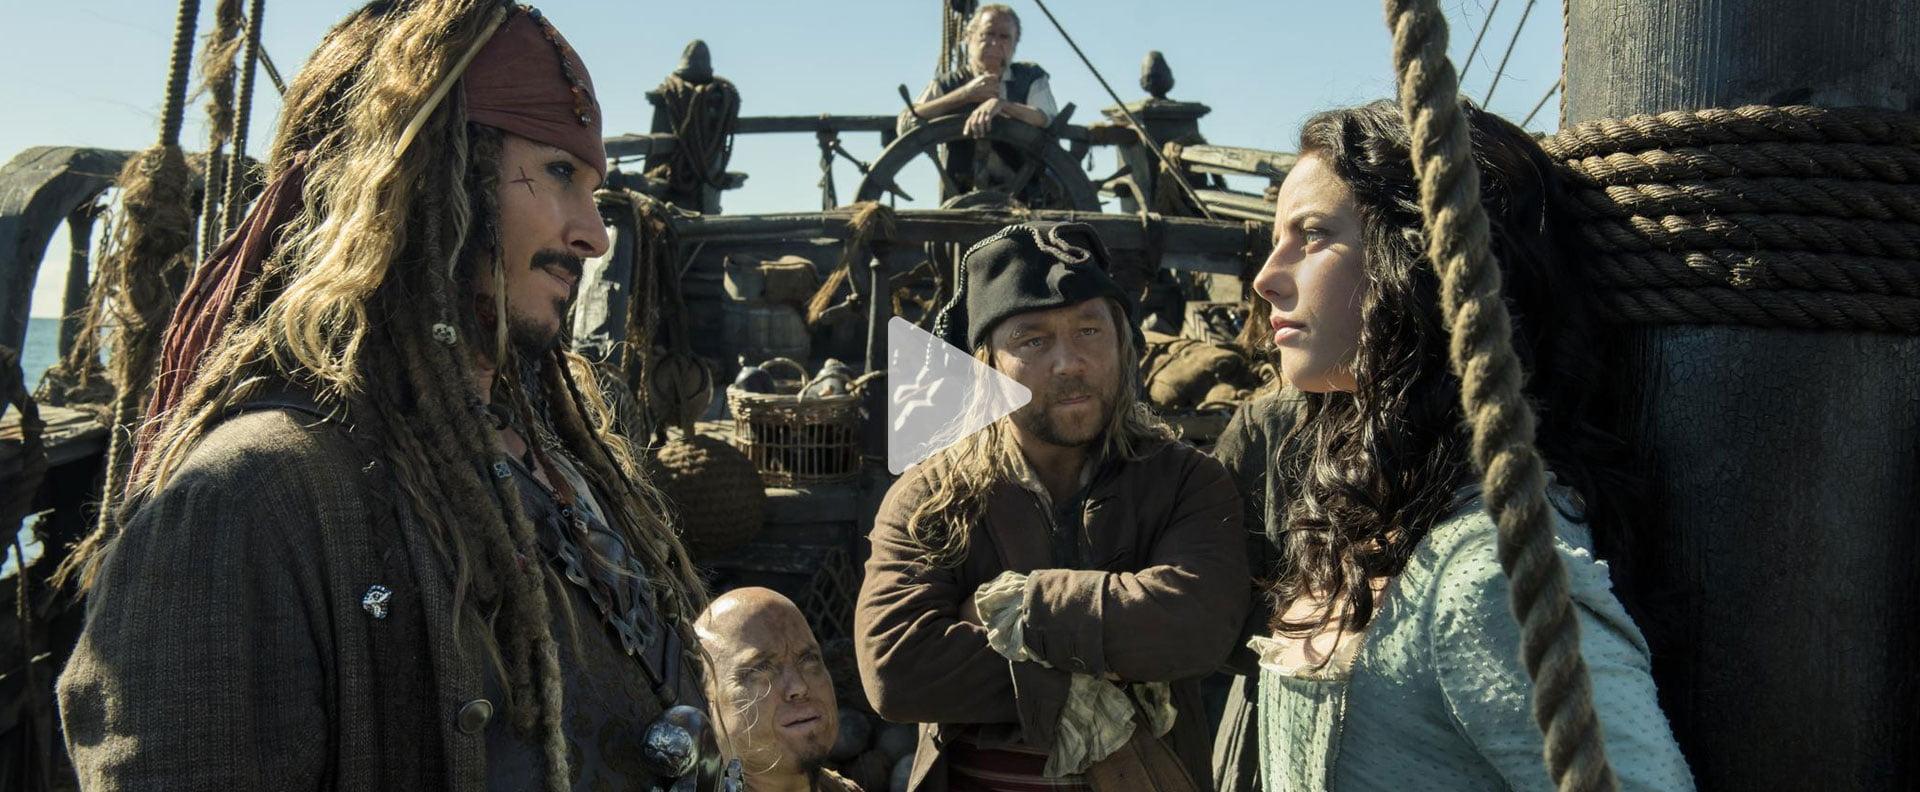 Пірати Карибського моря: Помста Салазара / Pirates of the Caribbean: Dead Men Tell No Tales (2017)